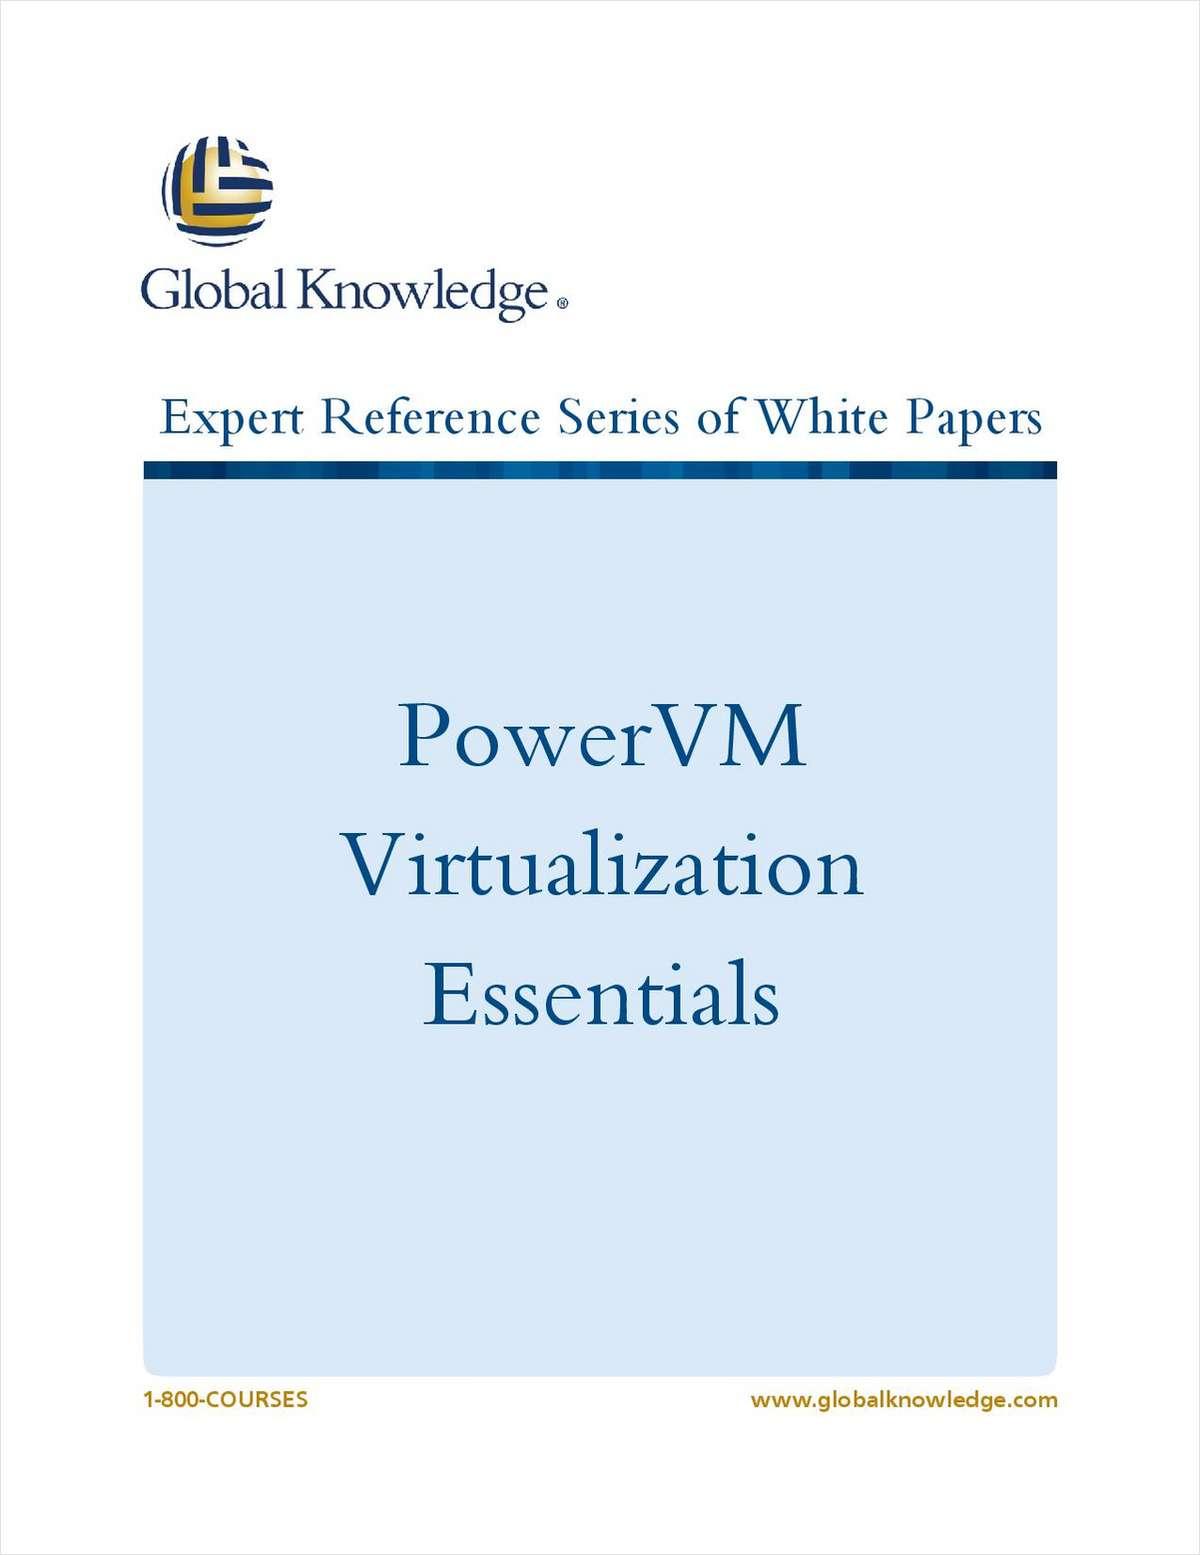 PowerVM Virtualization Essentials